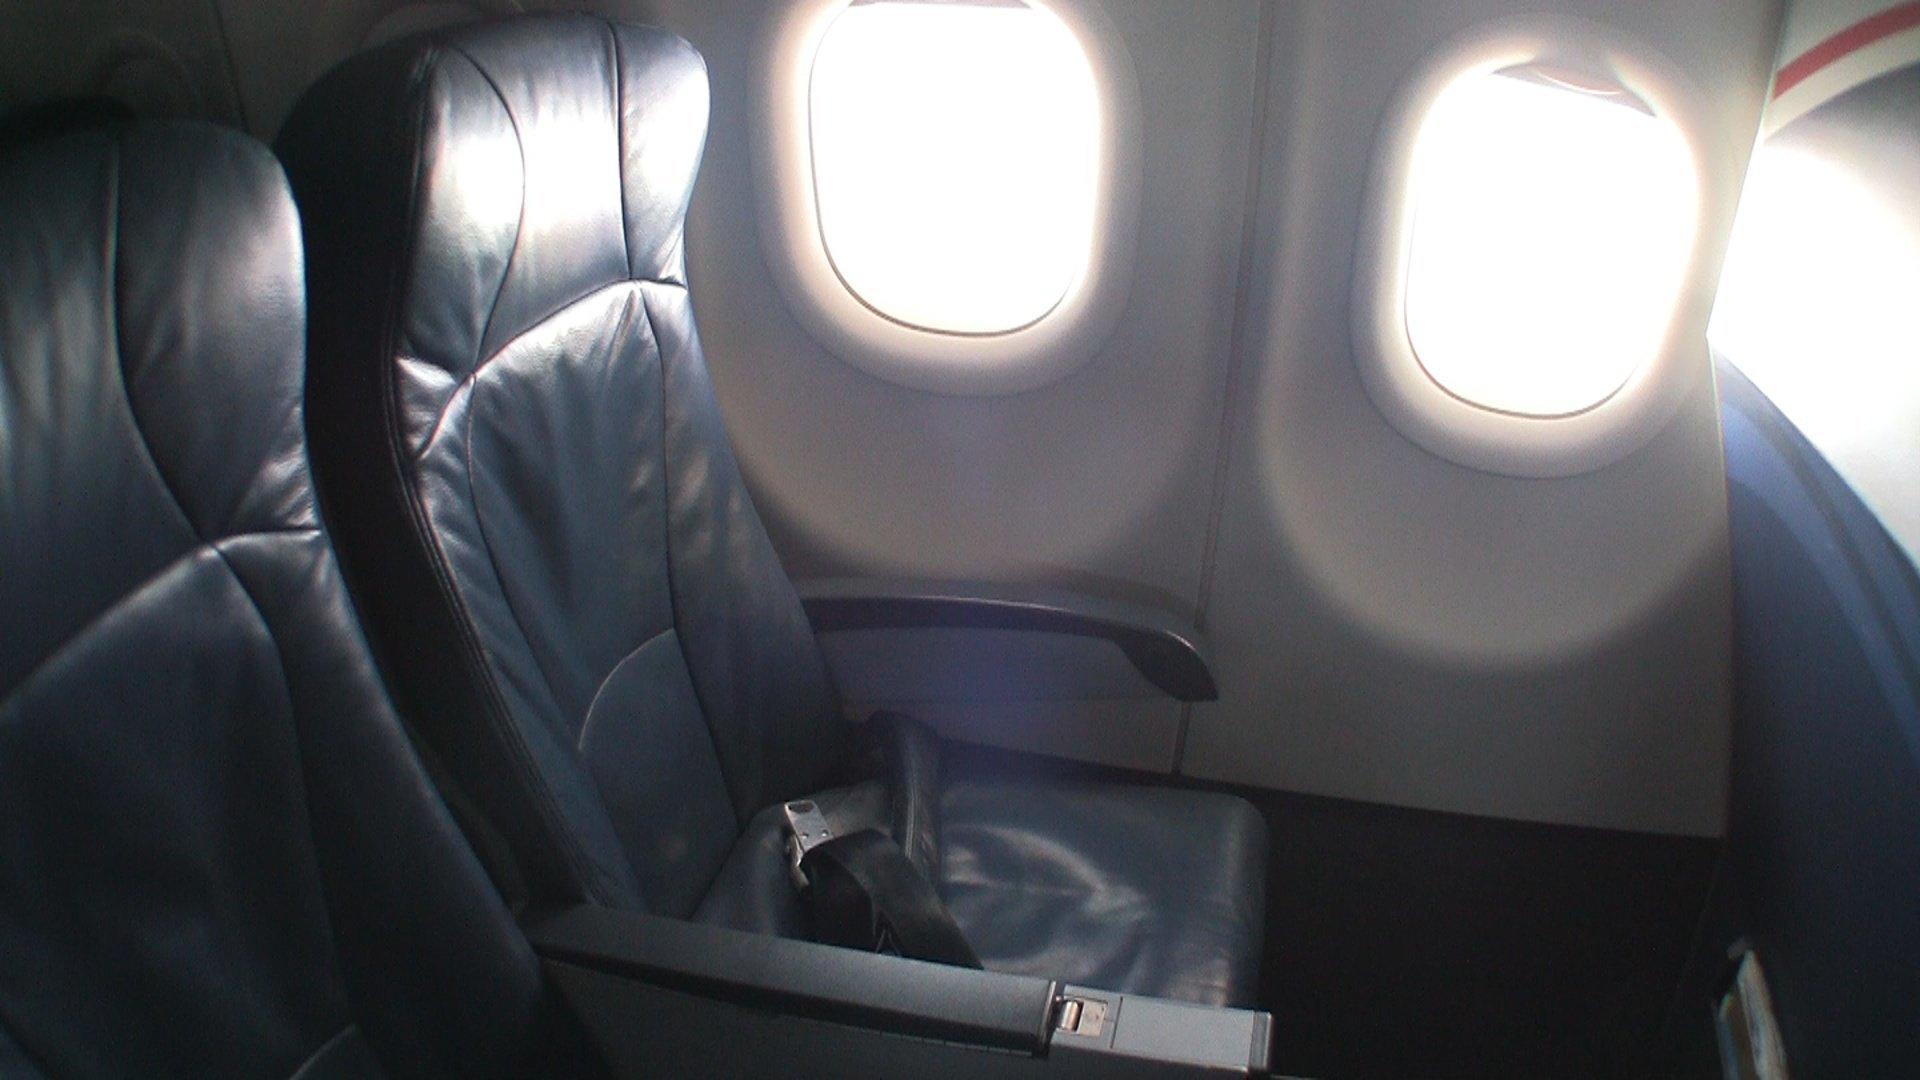 Video Us Airways Choice Seats A321 Row 5 Modhop Com